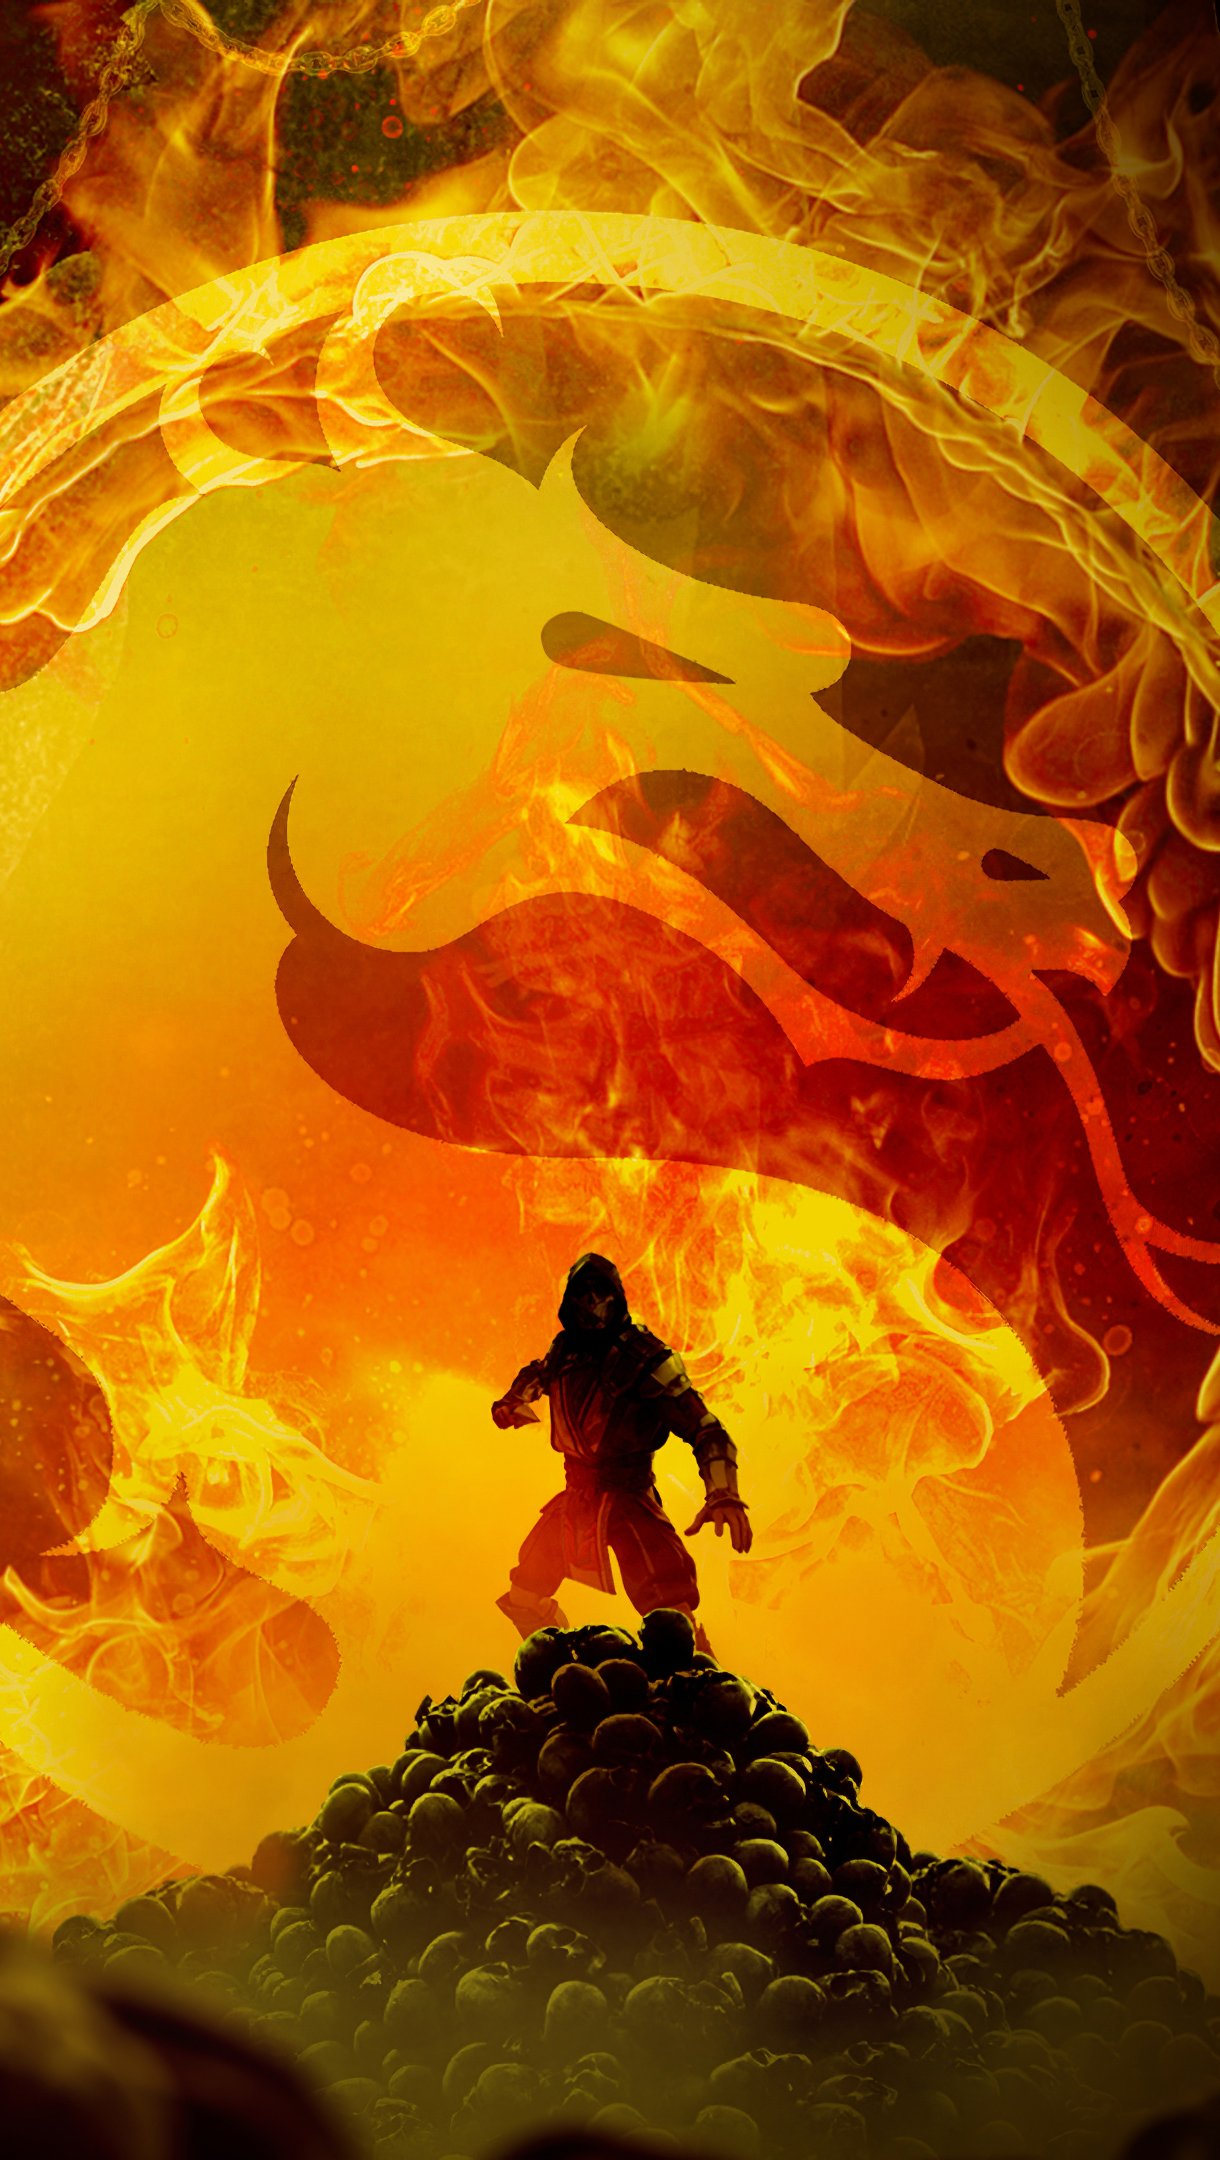 Wallpaper Mortal Kombat art Vertical